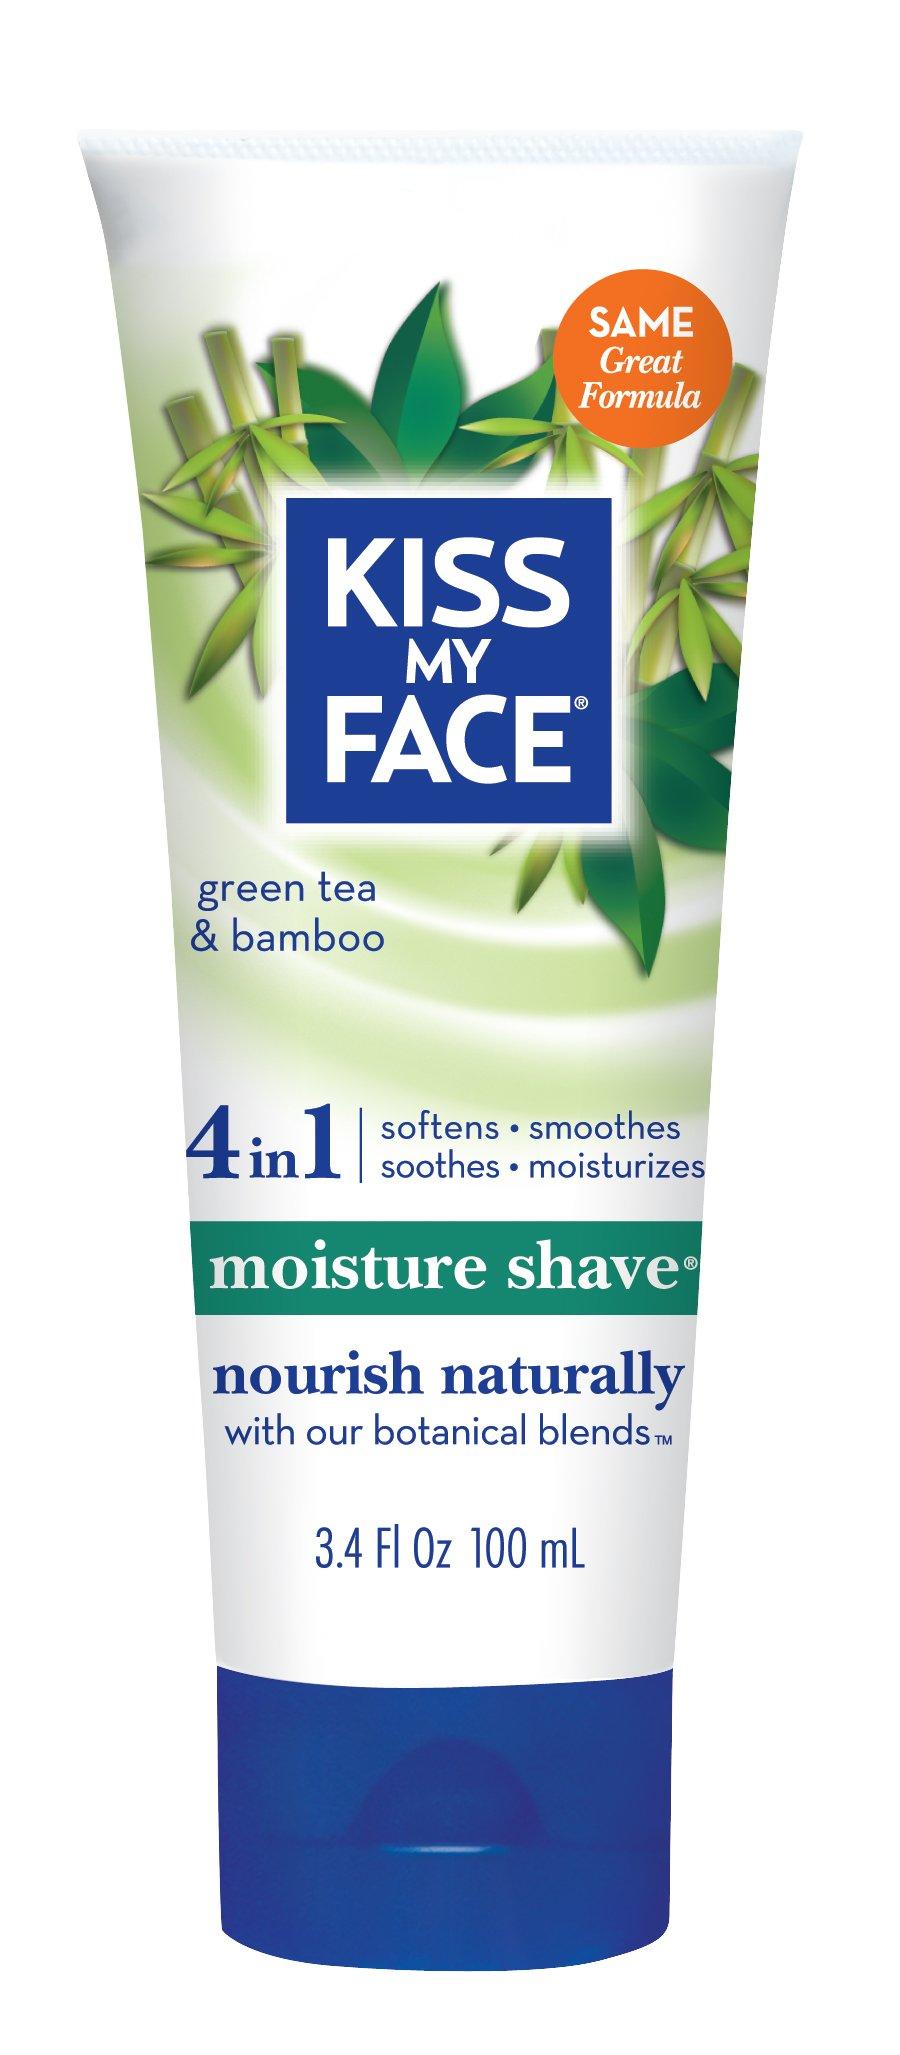 Kiss My Face Moisture Shave Shaving Cream, Green Tea and Bamboo Shaving Soap, 3.4 Ounce Travel Size